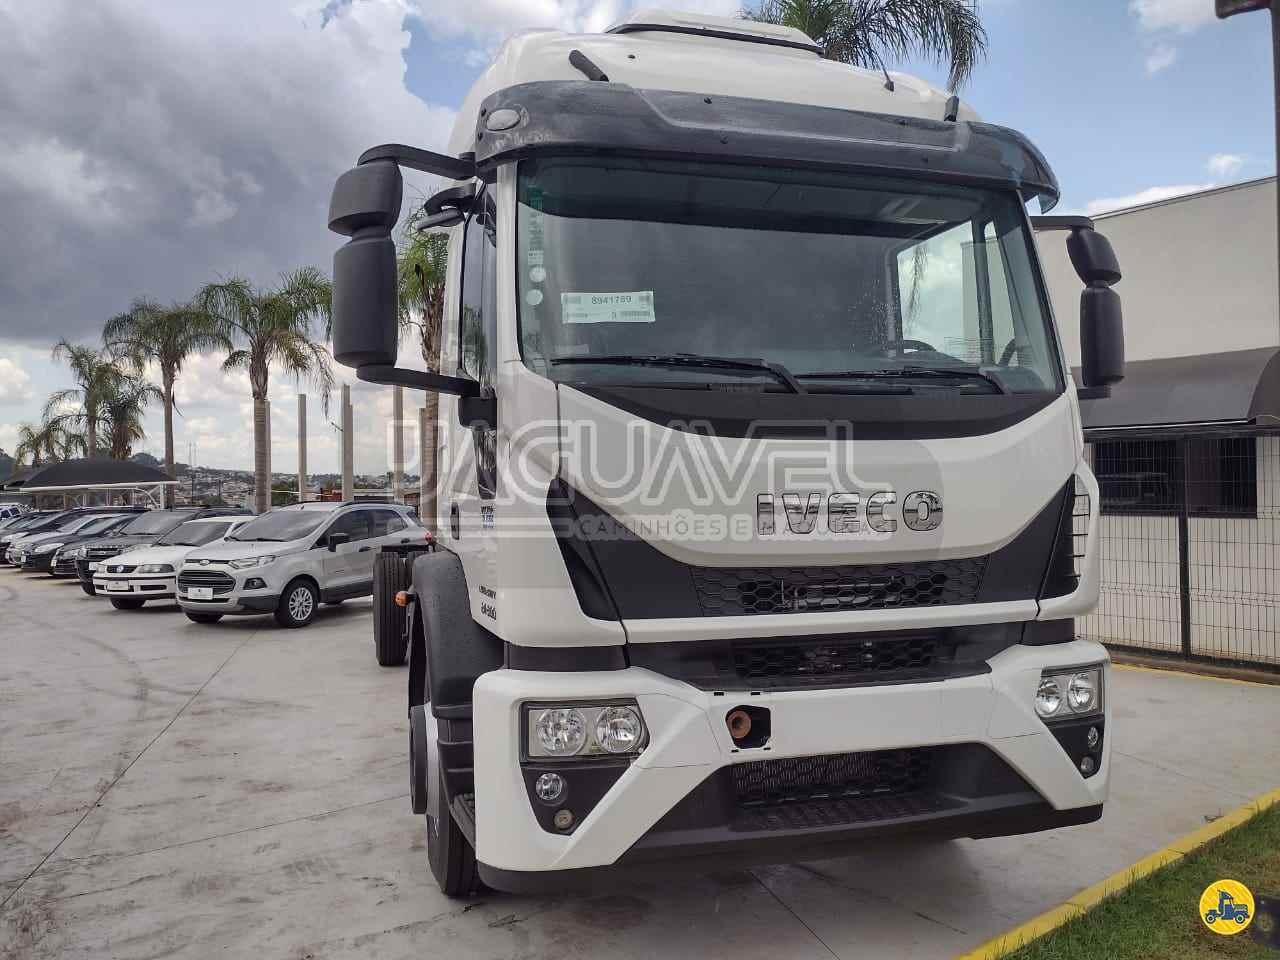 CAMINHAO IVECO Tector 24 300 Chassis Truck 6x2 Jaguavel Caminhões JAGUARIAIVA PARANÁ PR